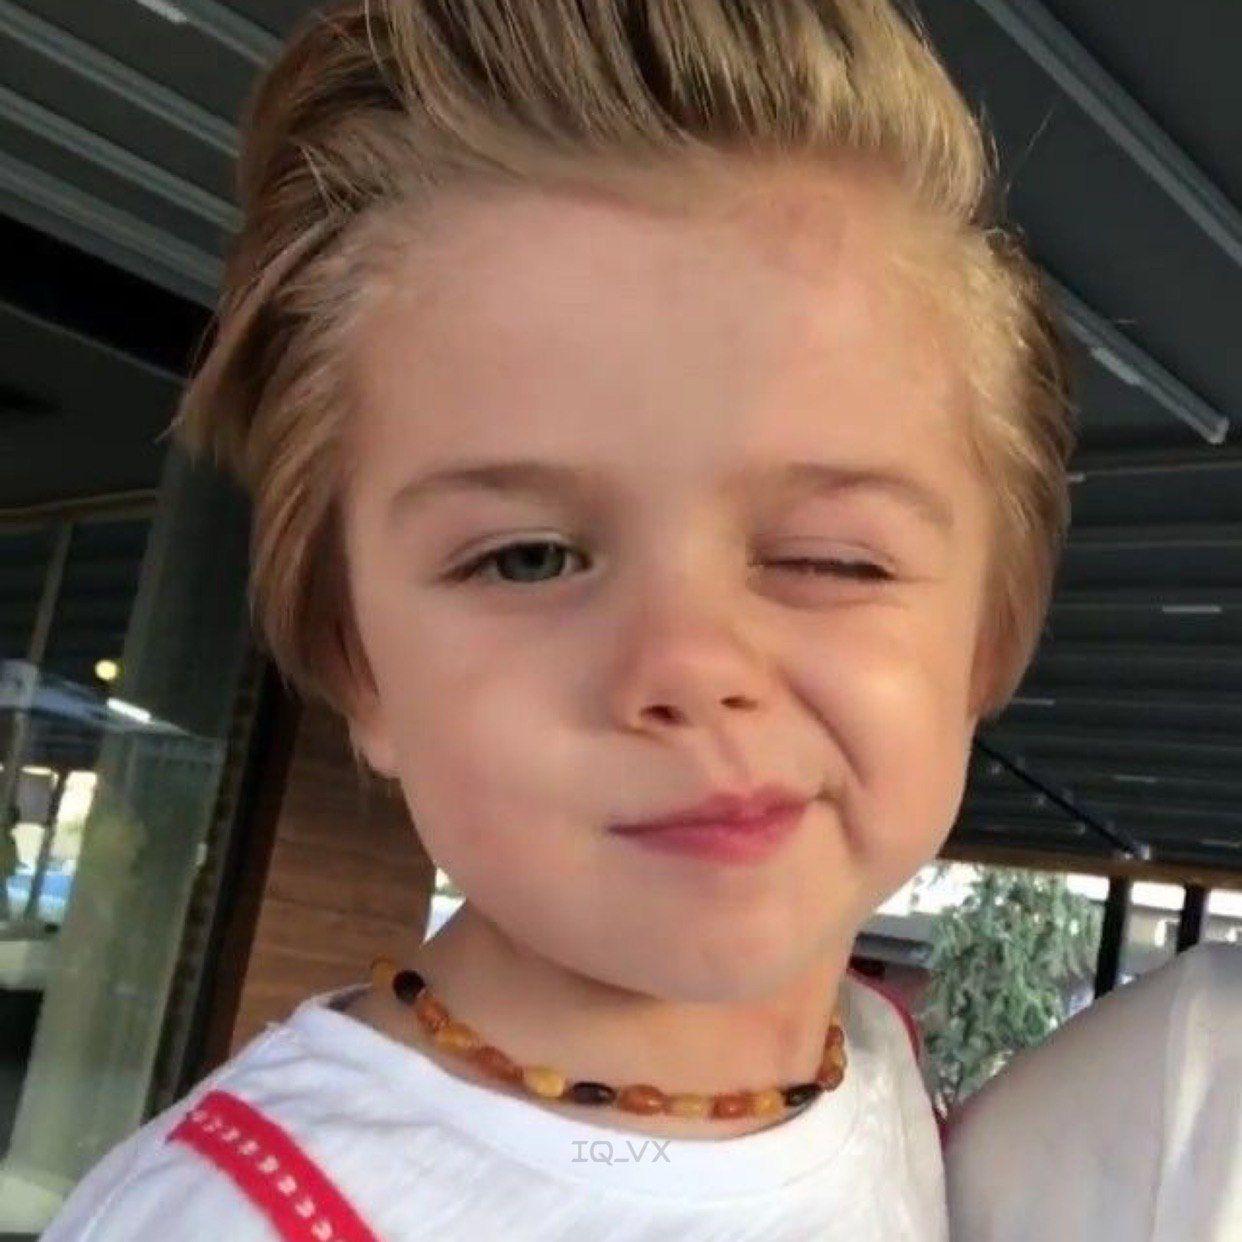 Pin By رمزيات On اطفال كيوت Baby Face Cute Kids Baby Kids